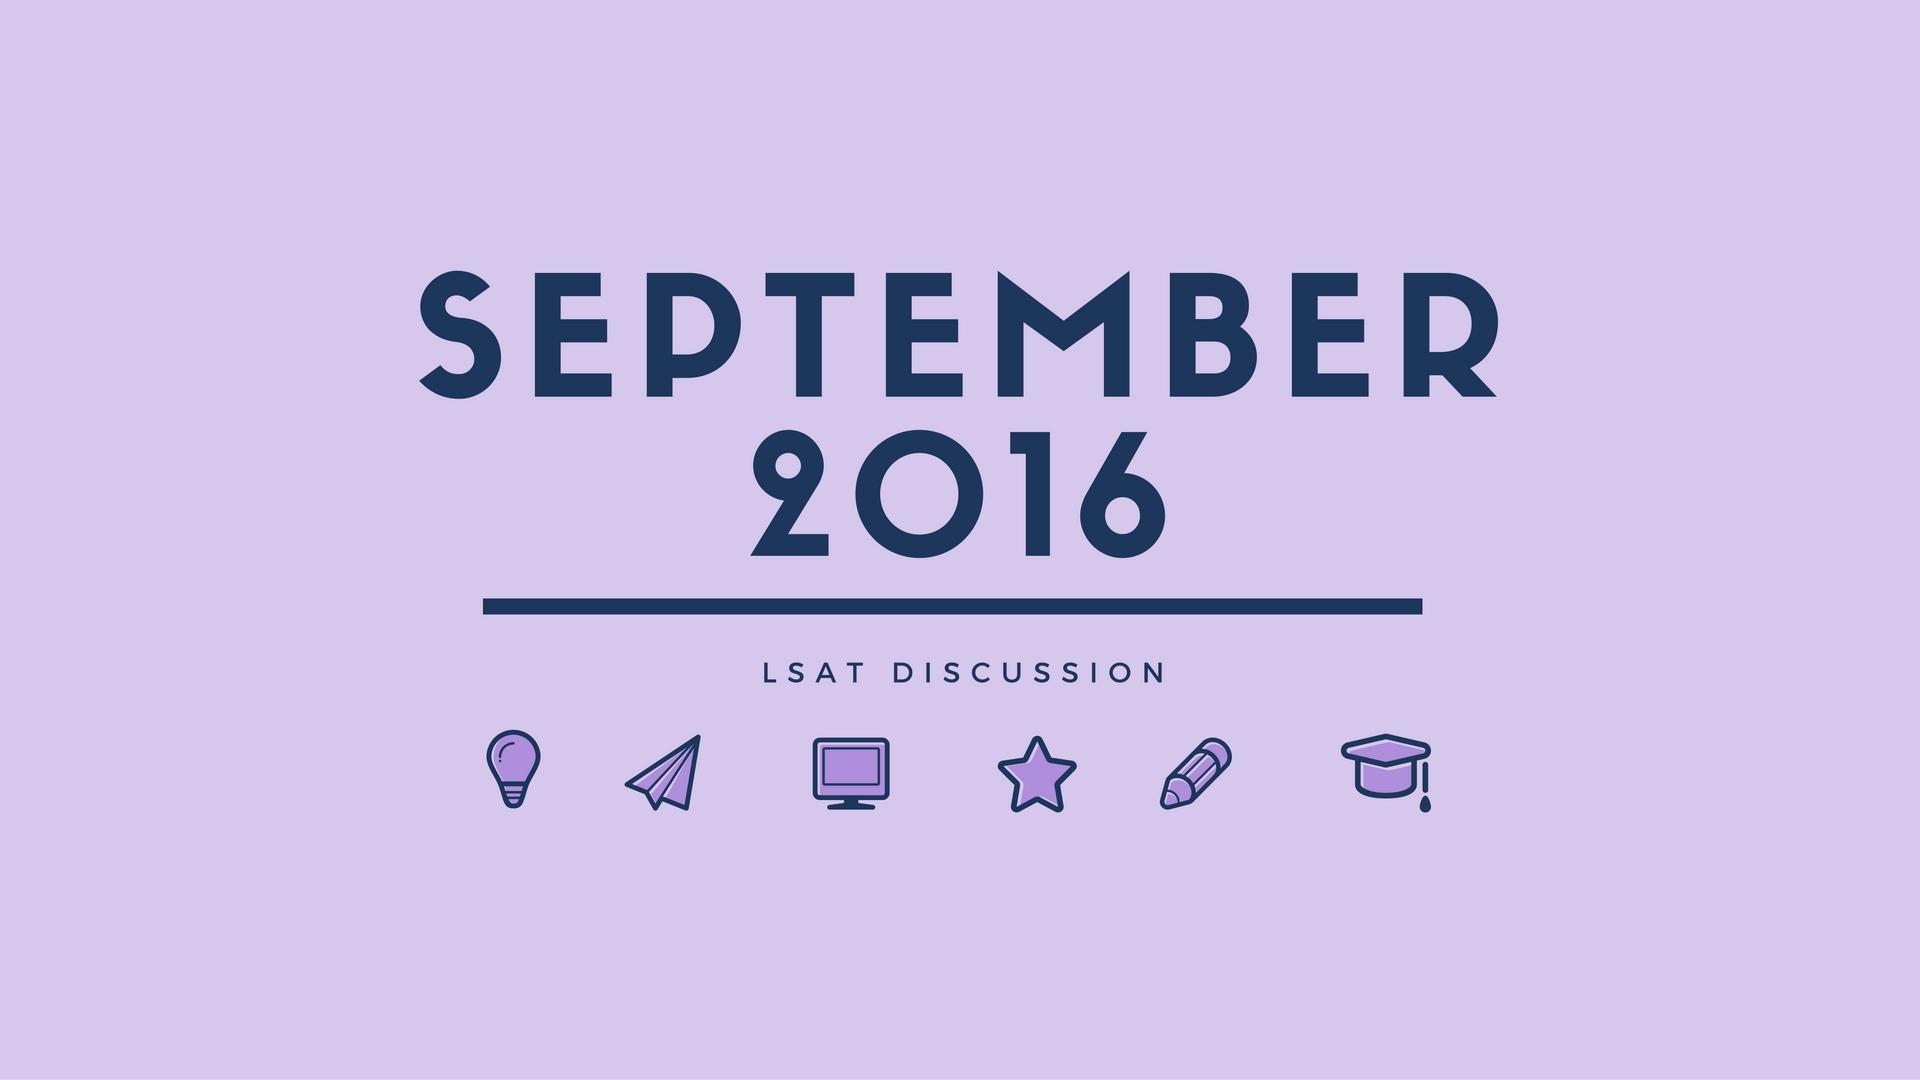 September 2016 lsat discussion lawschooli september 2016 lsat discussion geenschuldenfo Choice Image